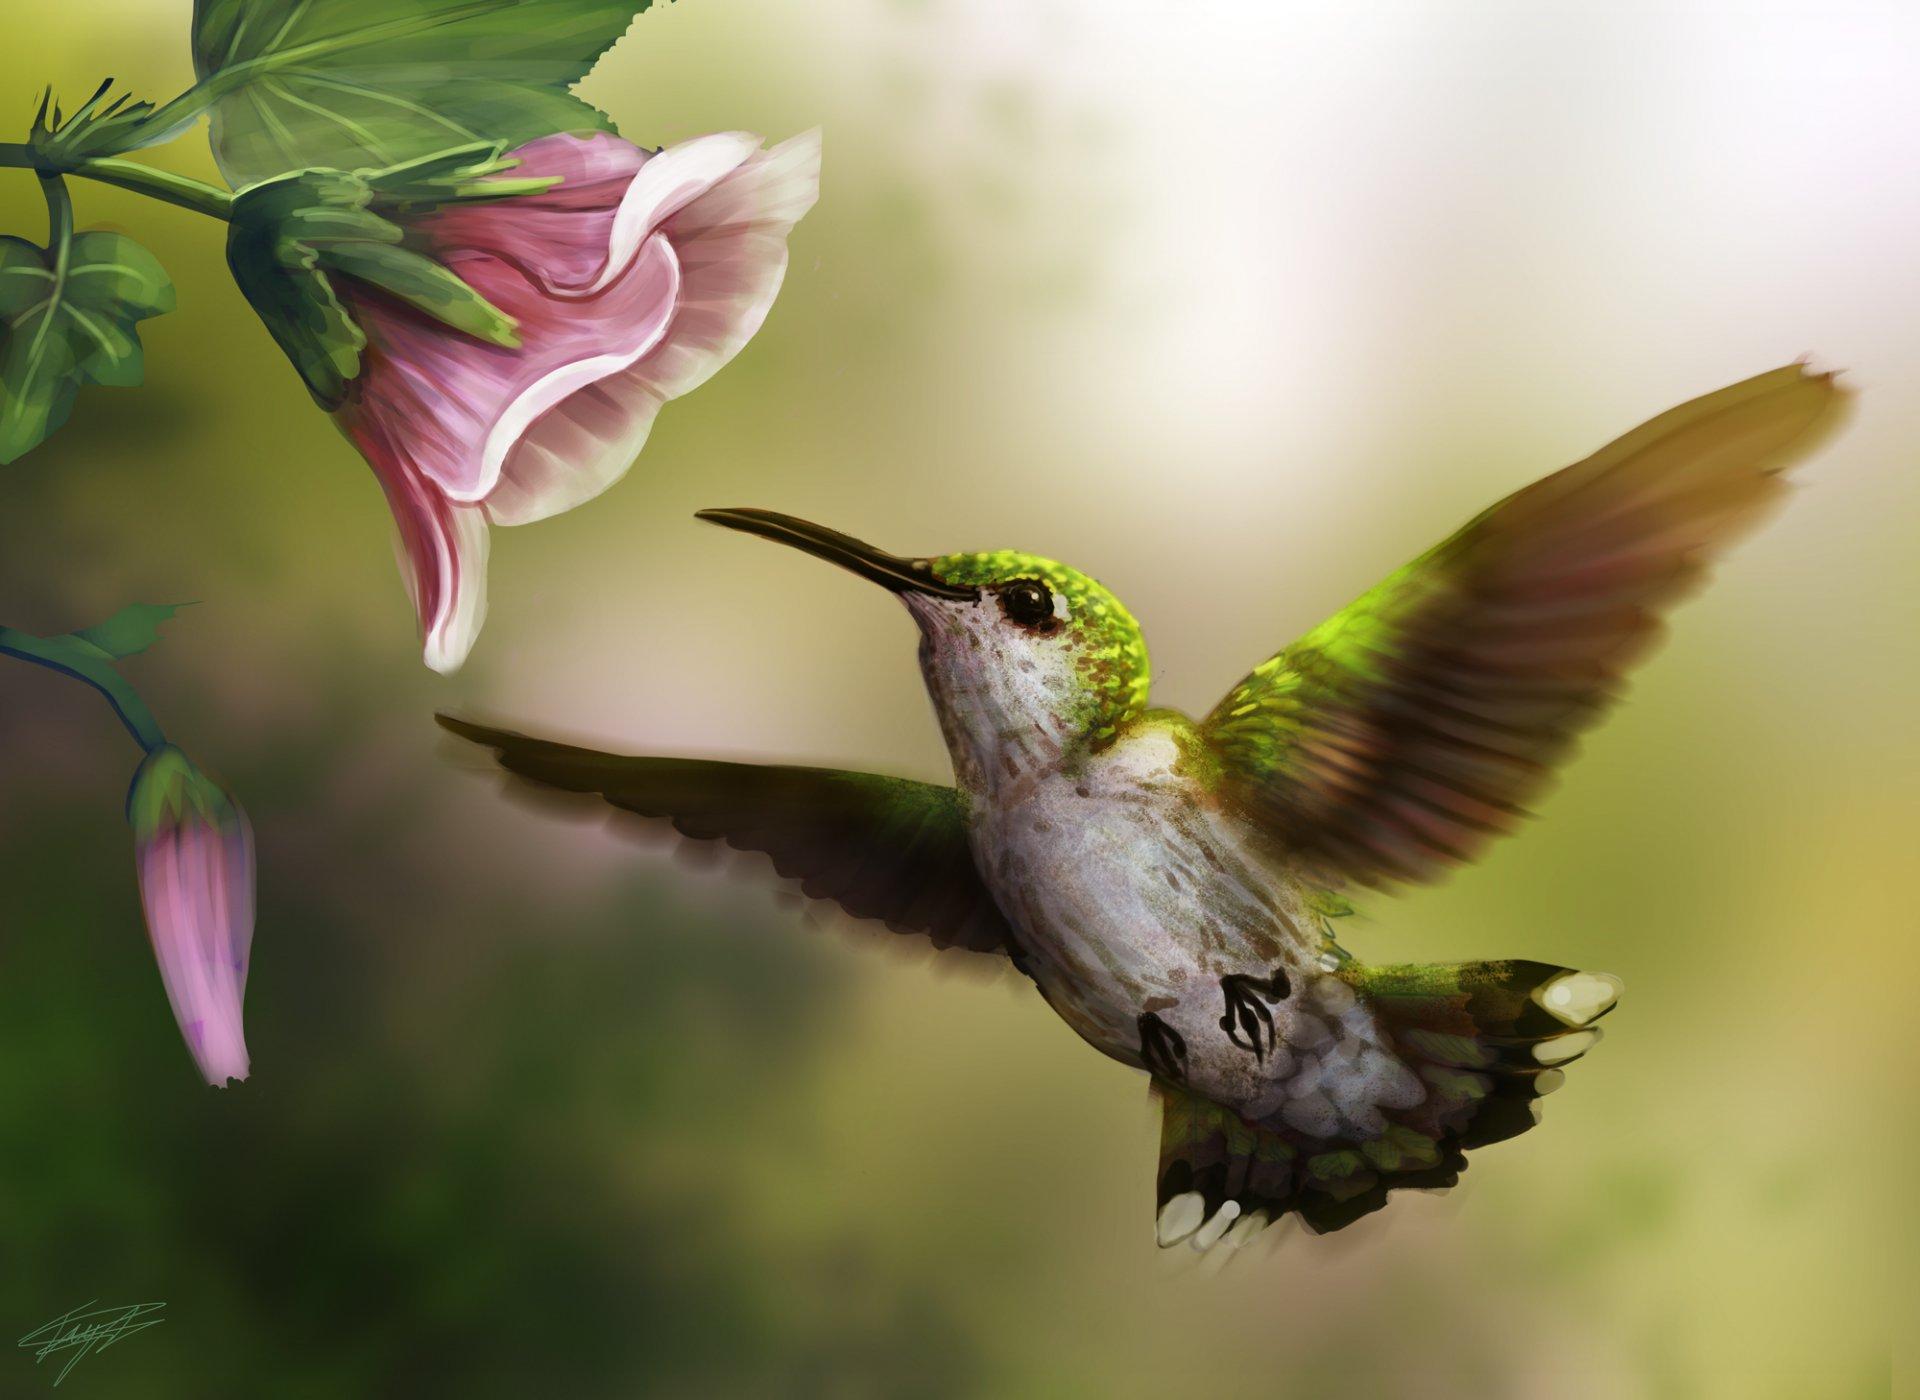 Картинки с цветами и птицами